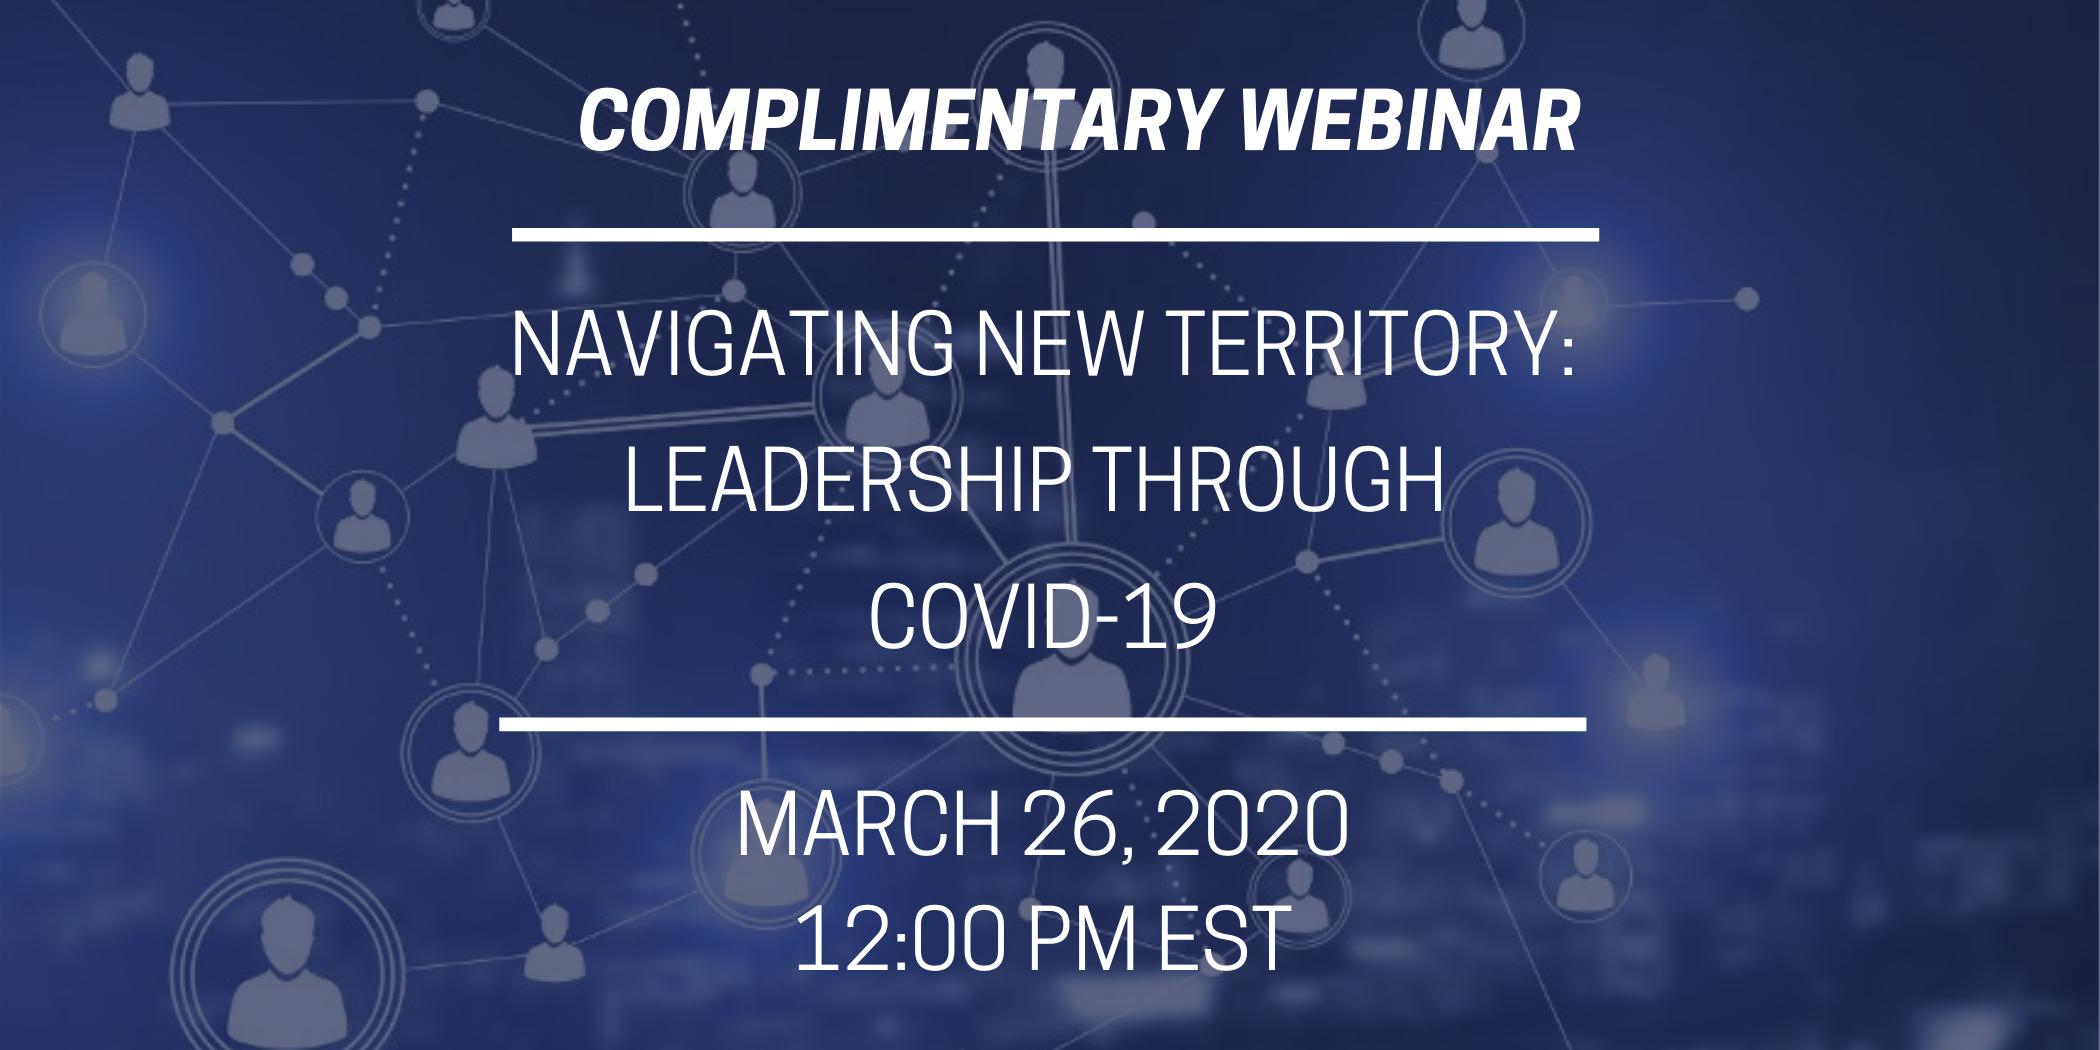 Webinar – Navigating New Territory: Leadership Through COVID-19